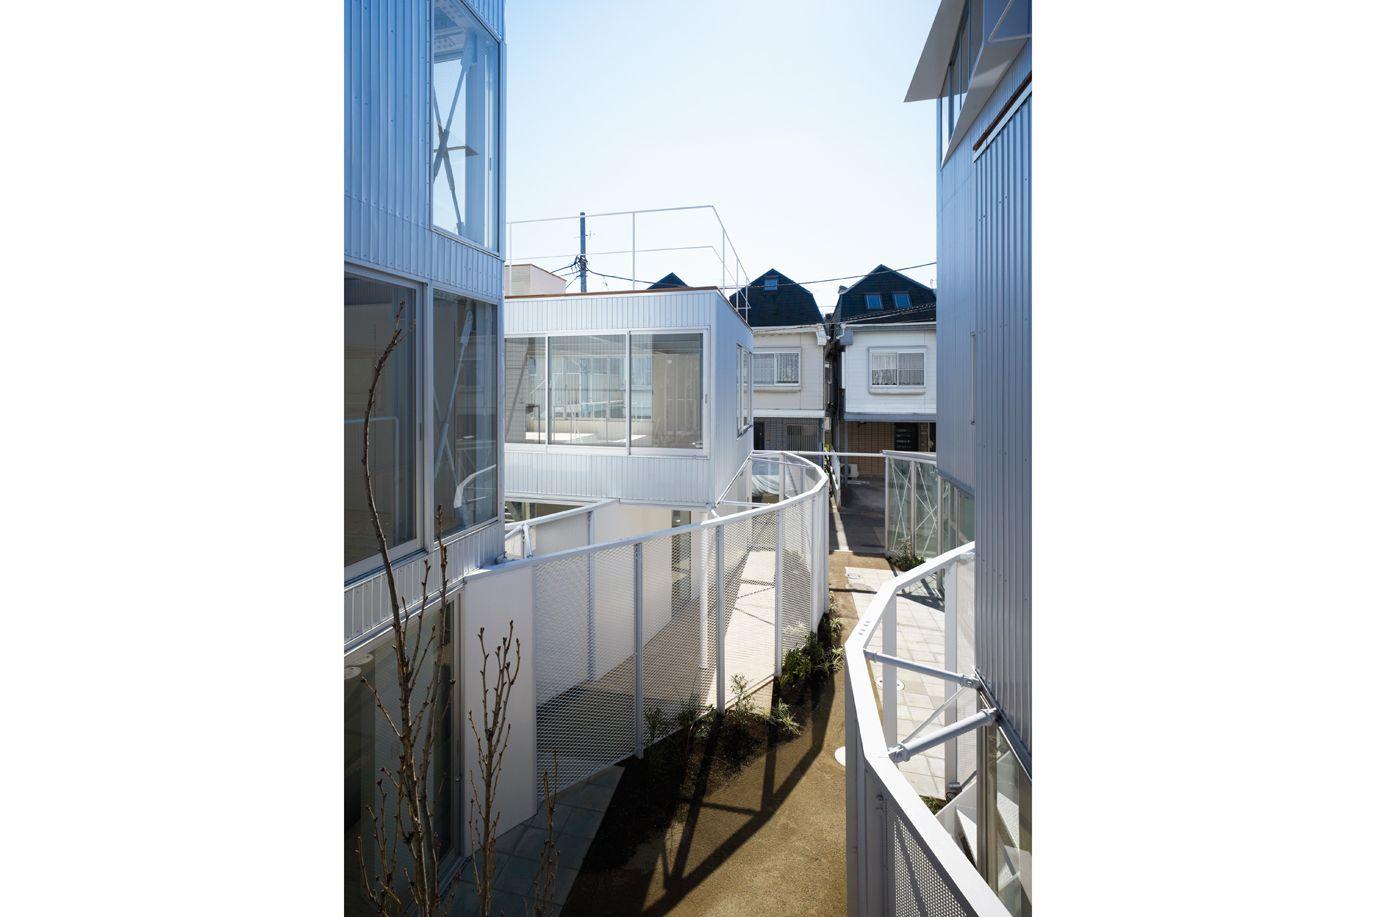 APARTMENT IN KAMITAKADA / Takashi Yamagata Architects, 2008 (J)